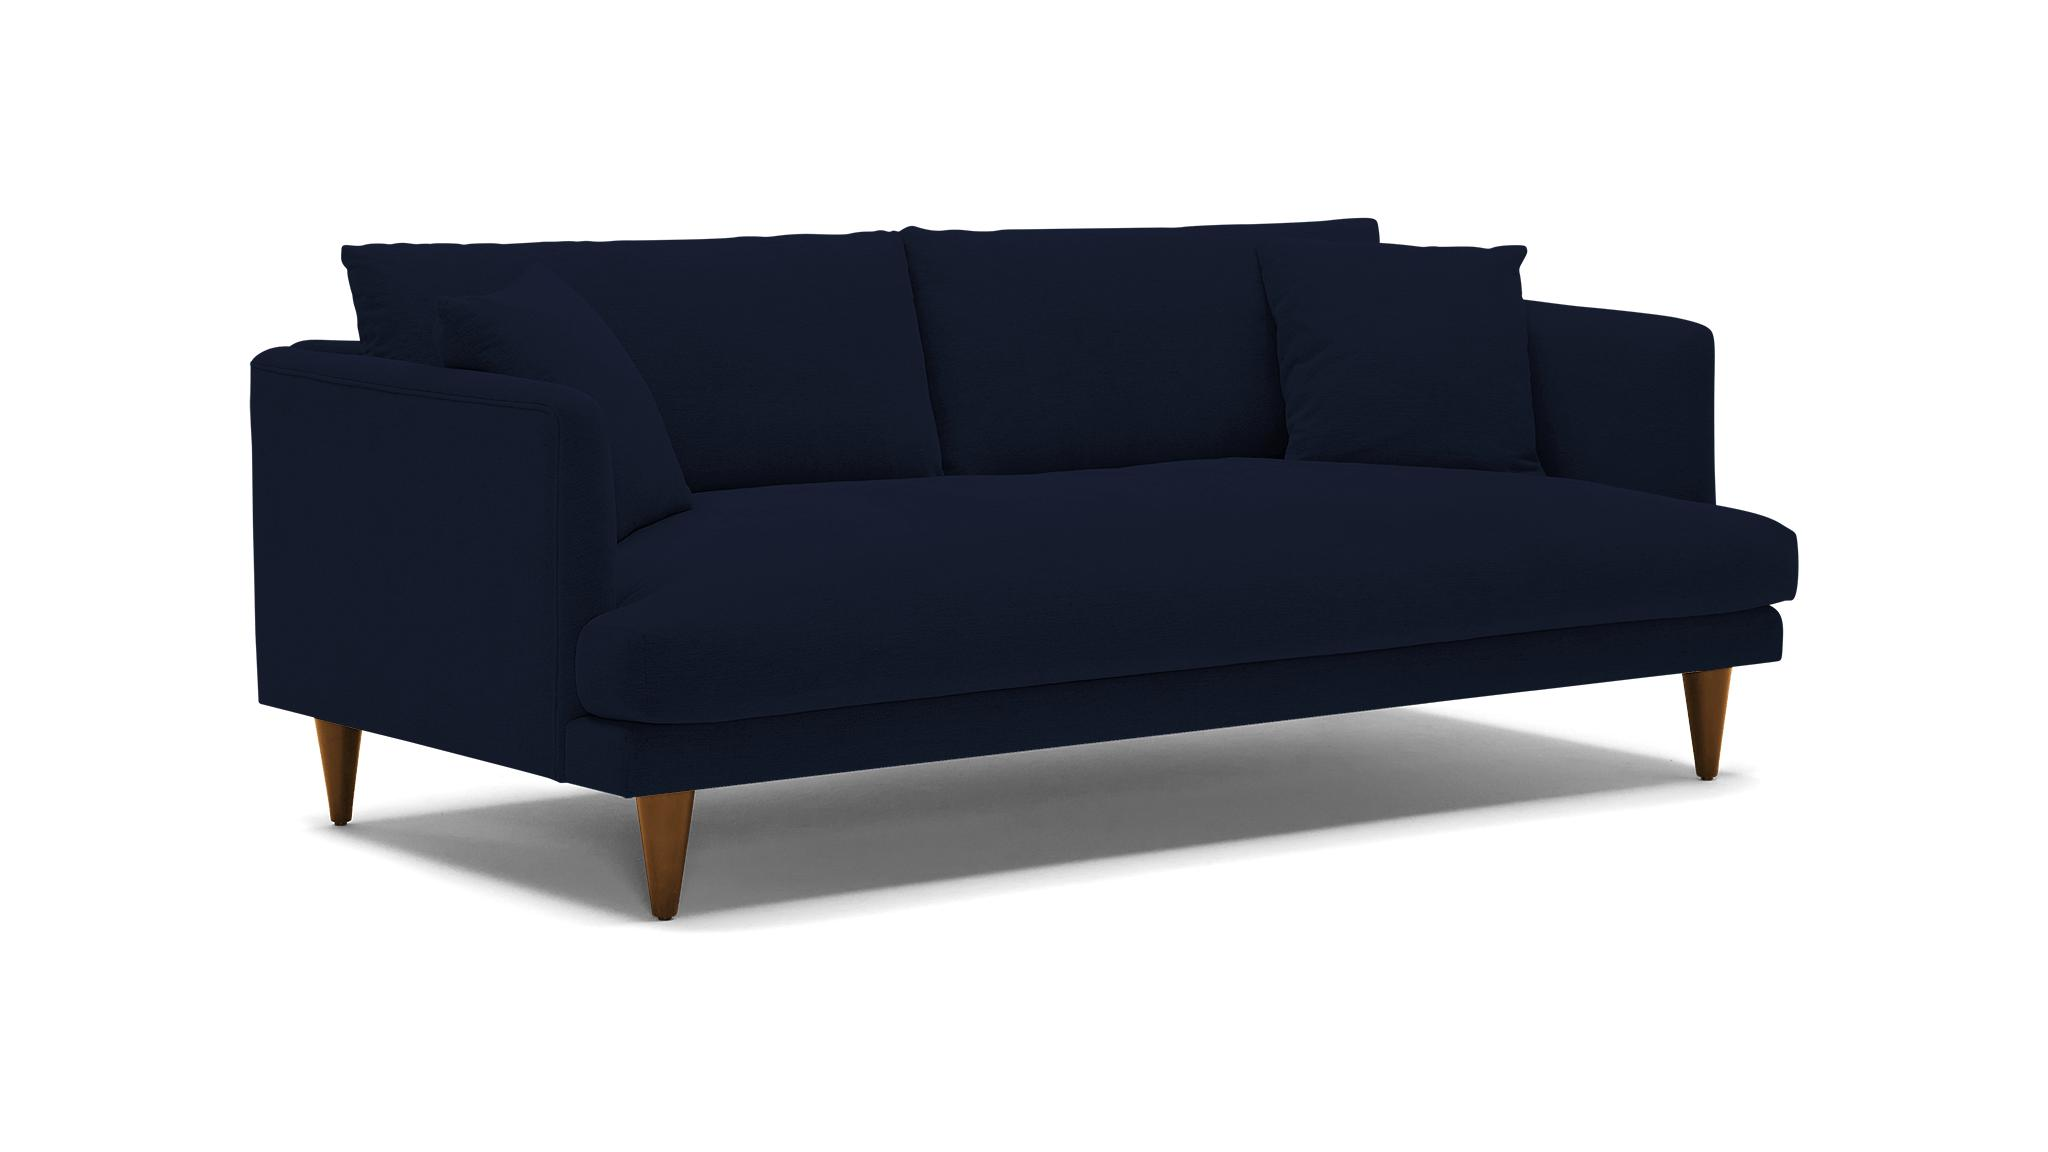 Blue Lewis Mid Century Modern Sofa - Bentley Indigo - Mocha - Cone